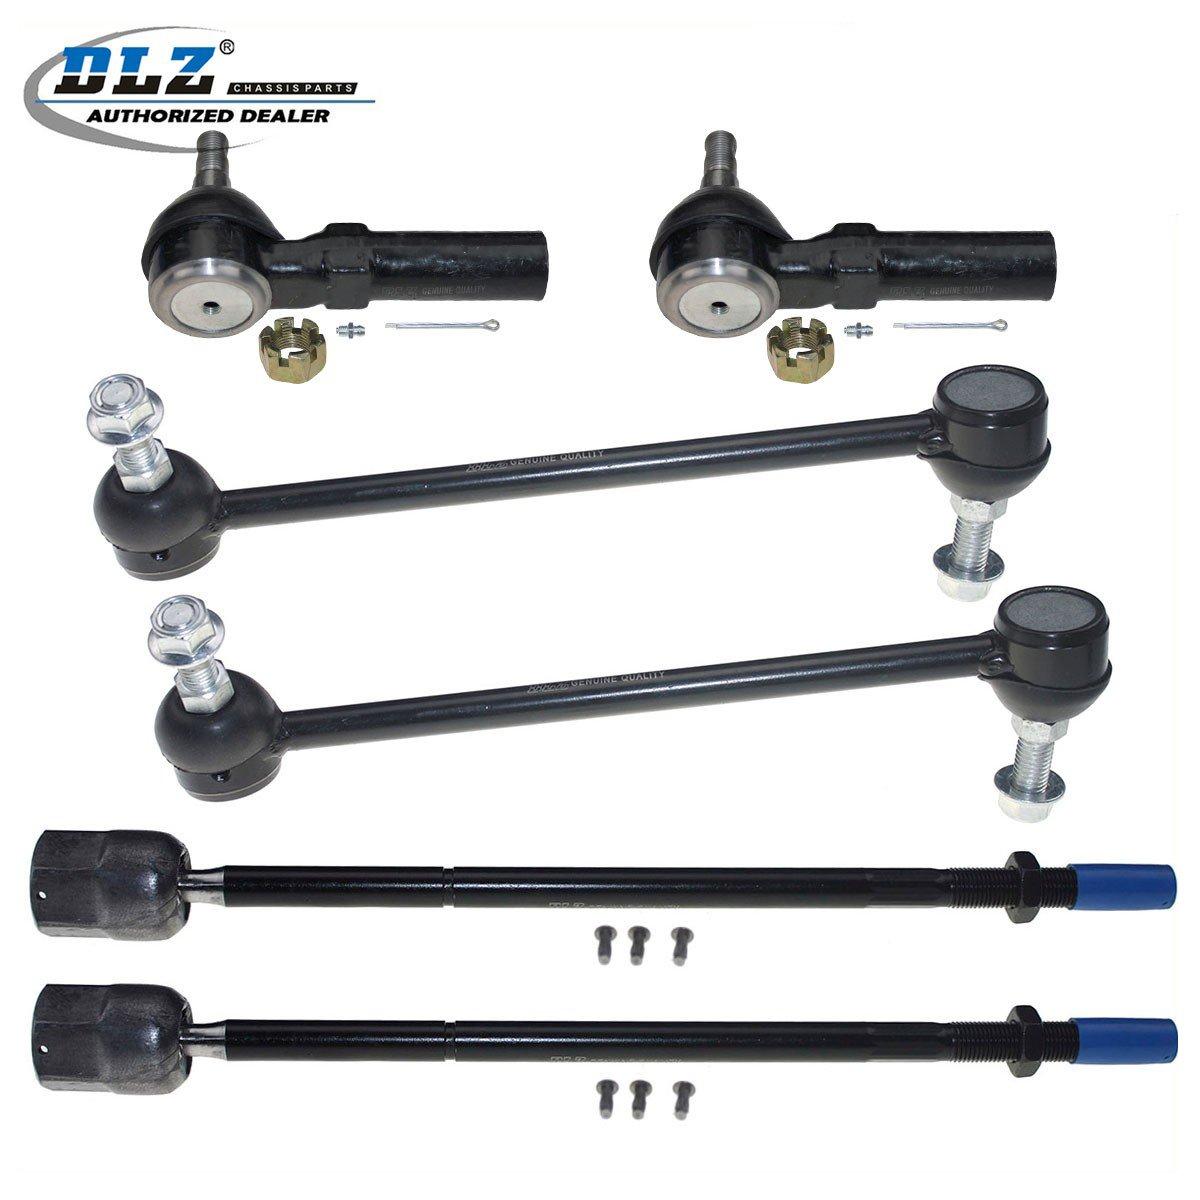 DLZ 6 Pcs Front Suspension Kit-2 Inner 2 Outer Tie Rod End 2 Sway Bar Link Compatible with 1995 1996 1997 1998 1999 2000 2001 2002 2003 Ford Windstar EV315 ES3181RL K8702 Partsgoing